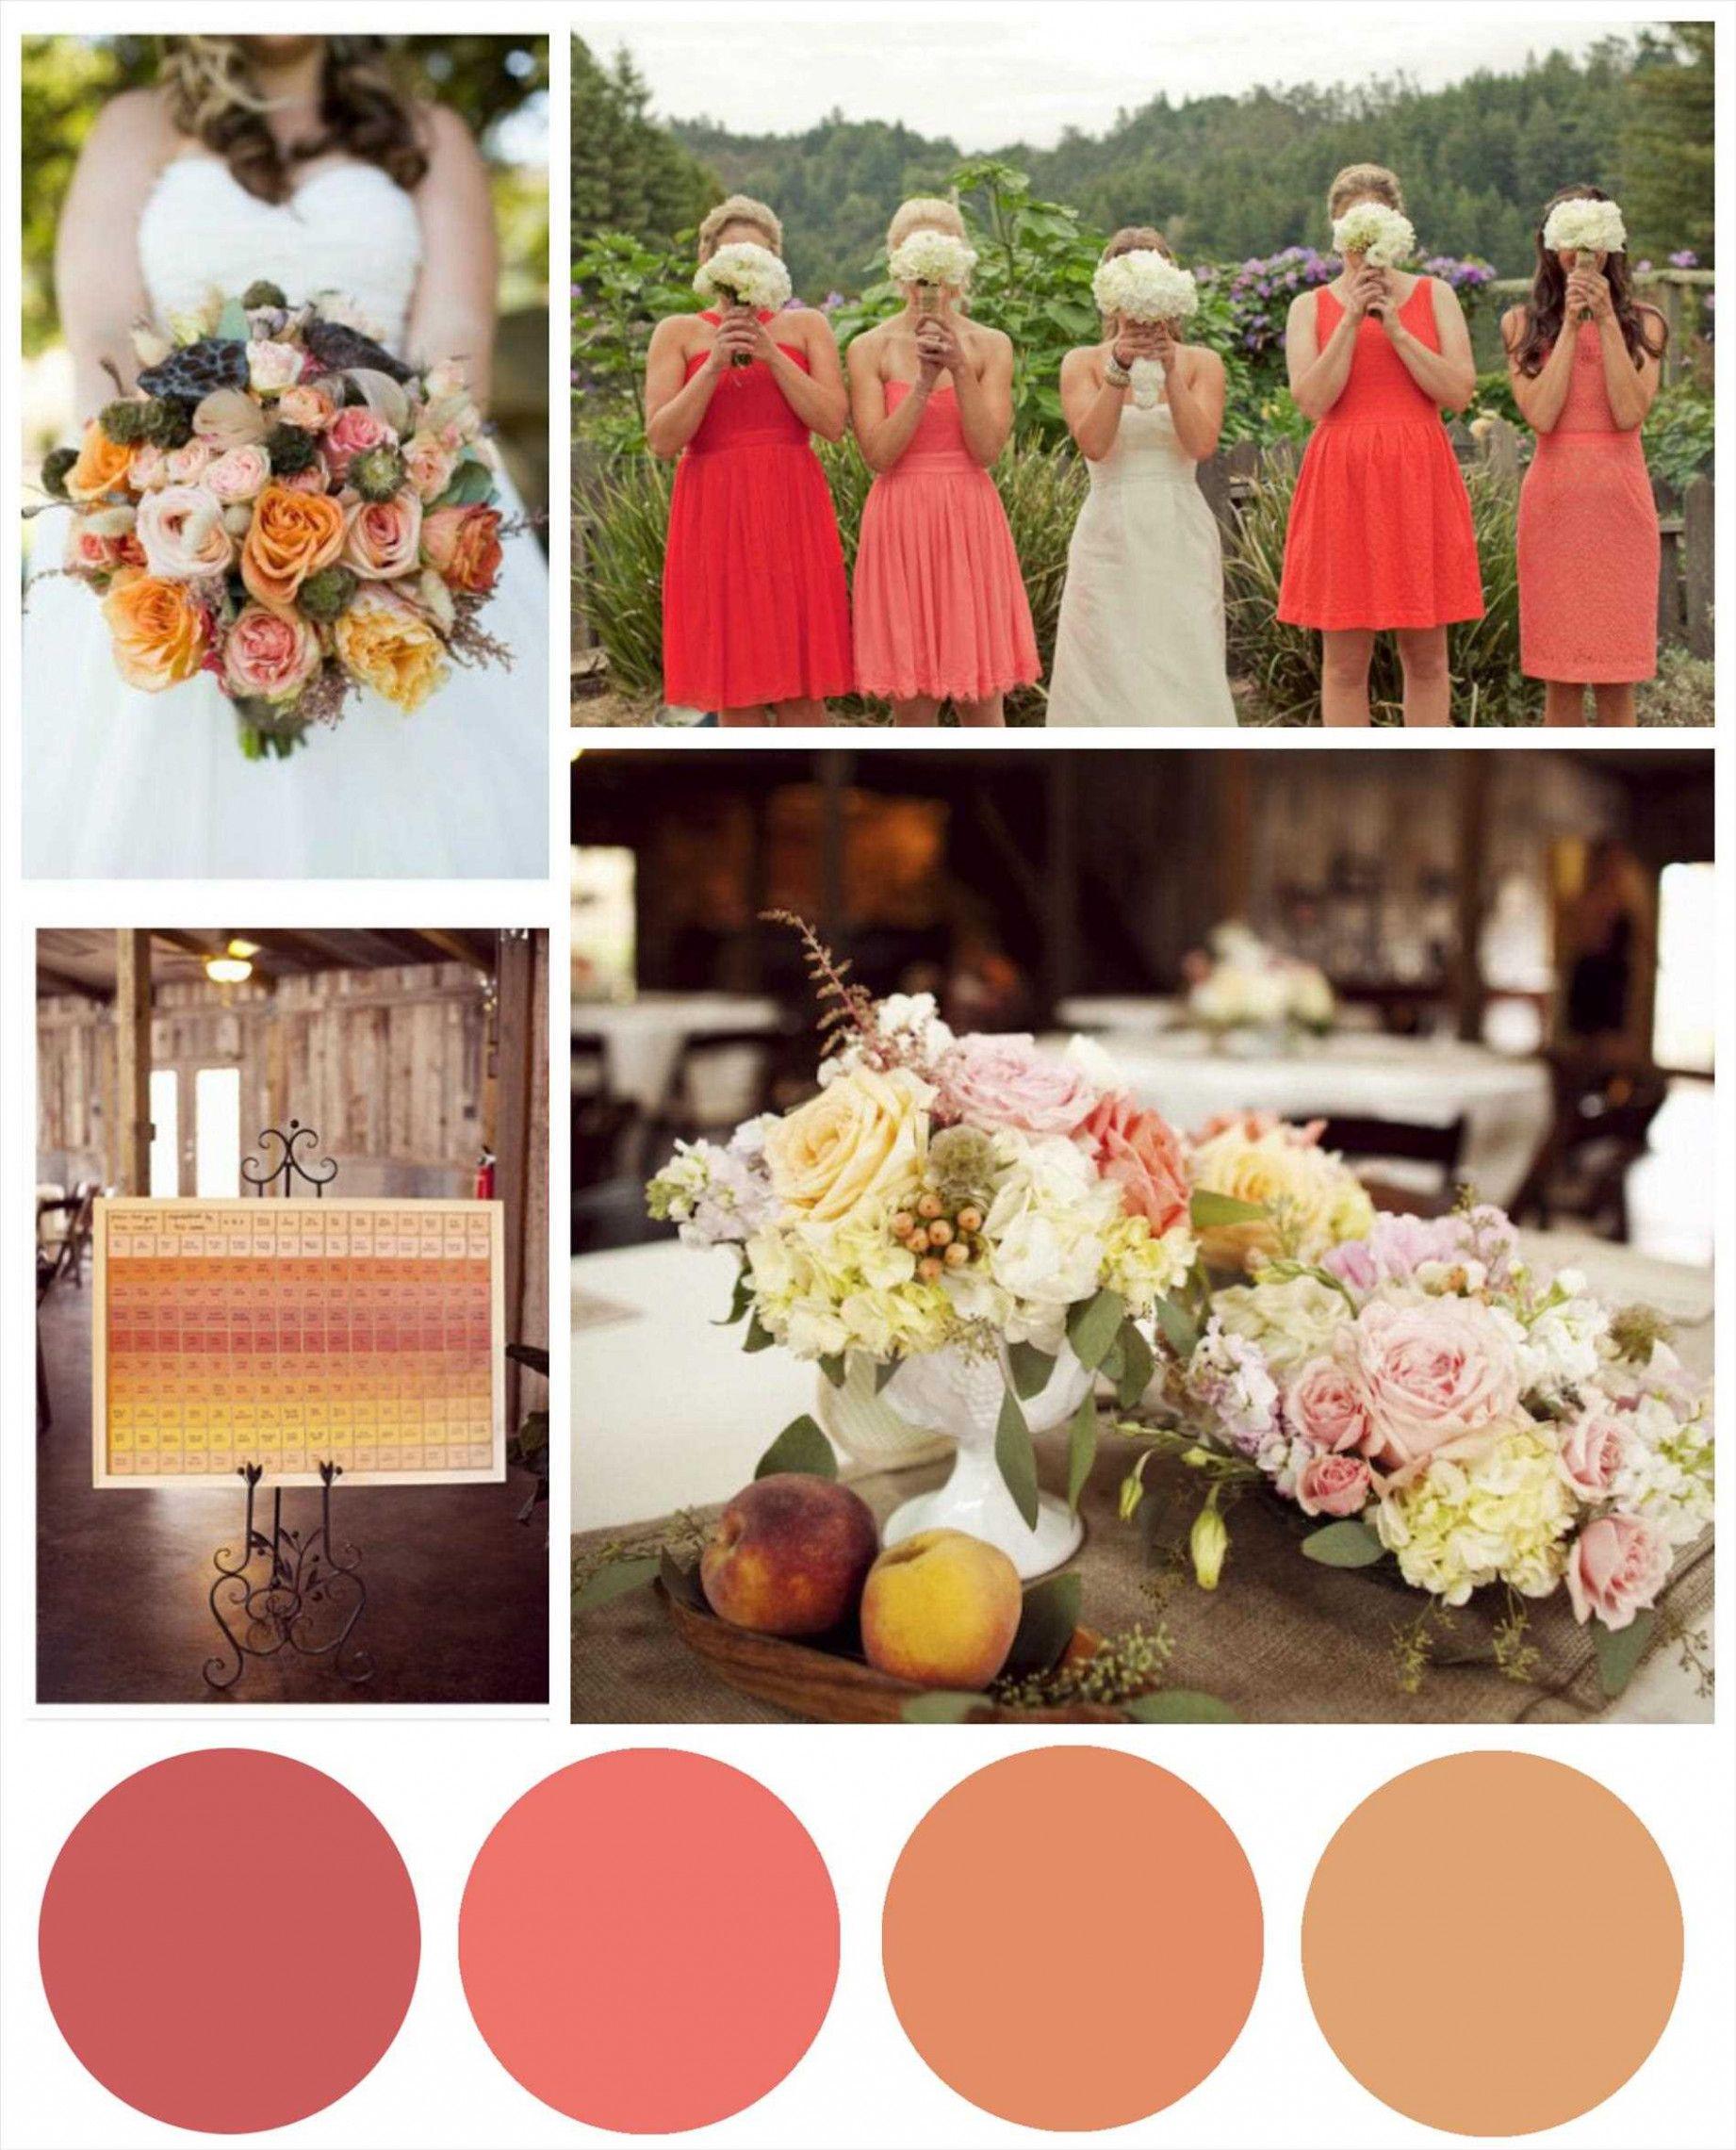 themed weddings and beach wedding color ideas for summer